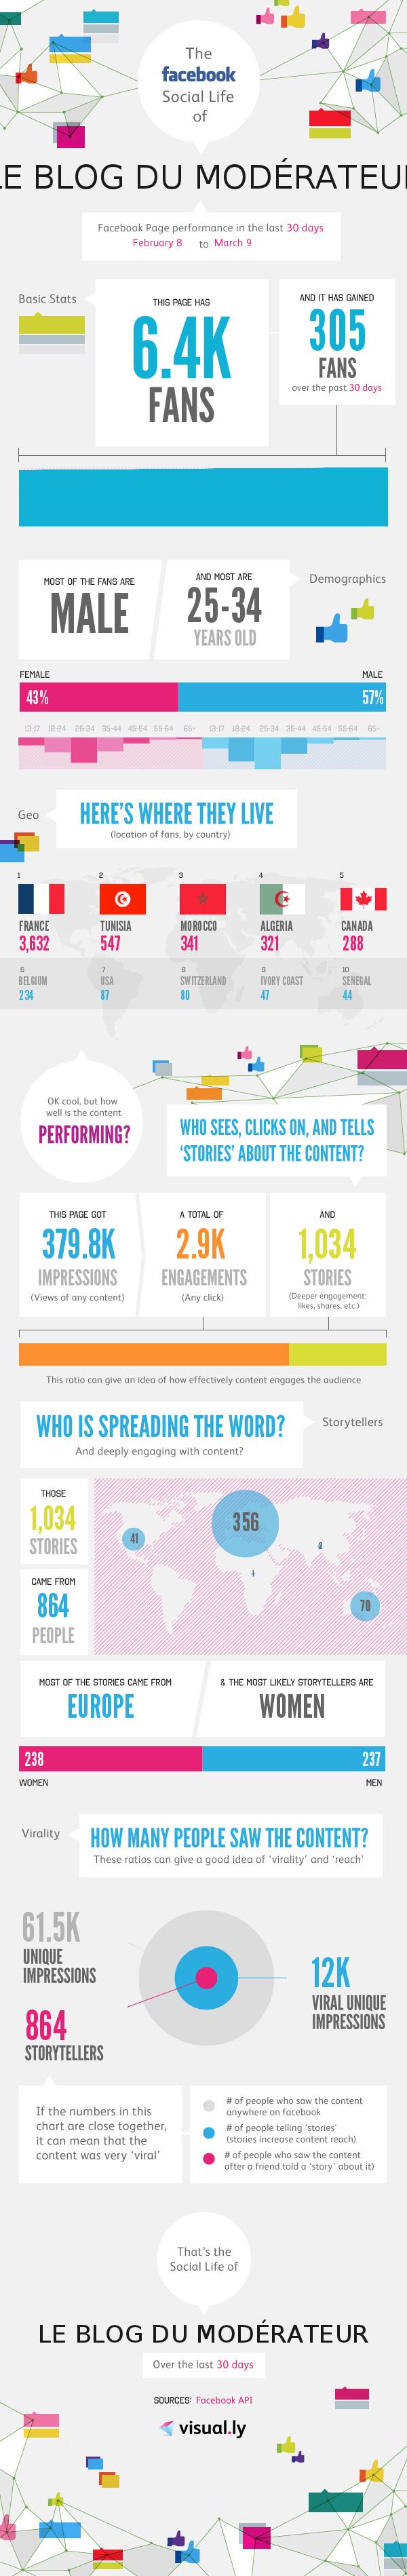 infographie-blogdumoderateur